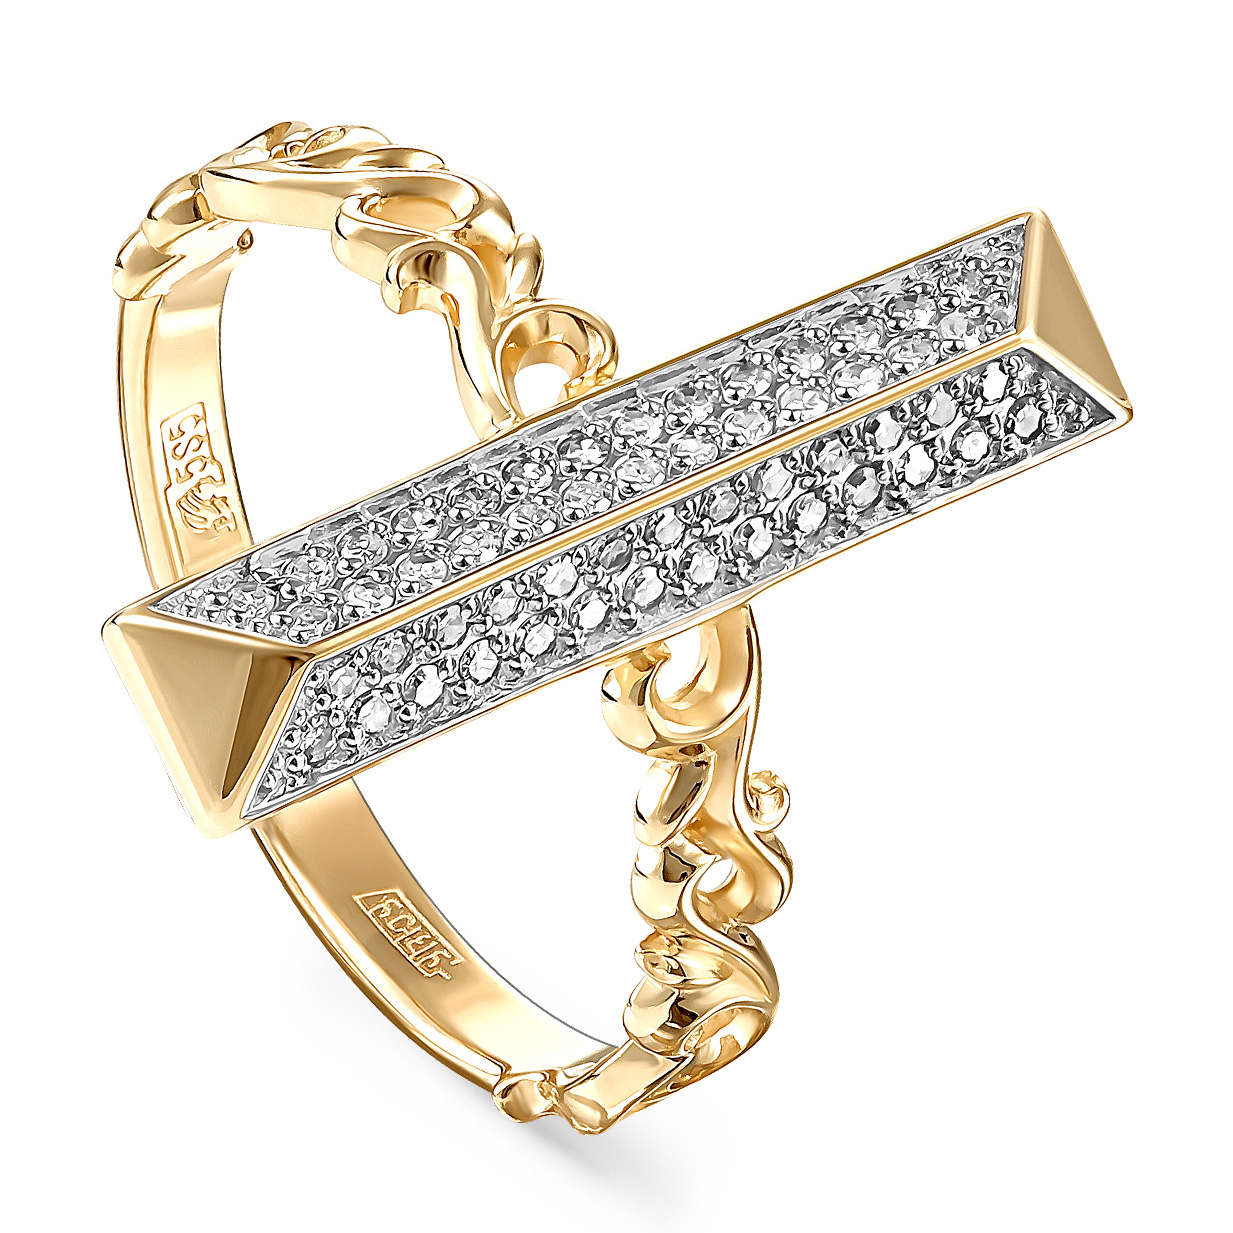 Кольцо из лимонного золота Бриллиант арт. 11-21057-1000 11-21057-1000